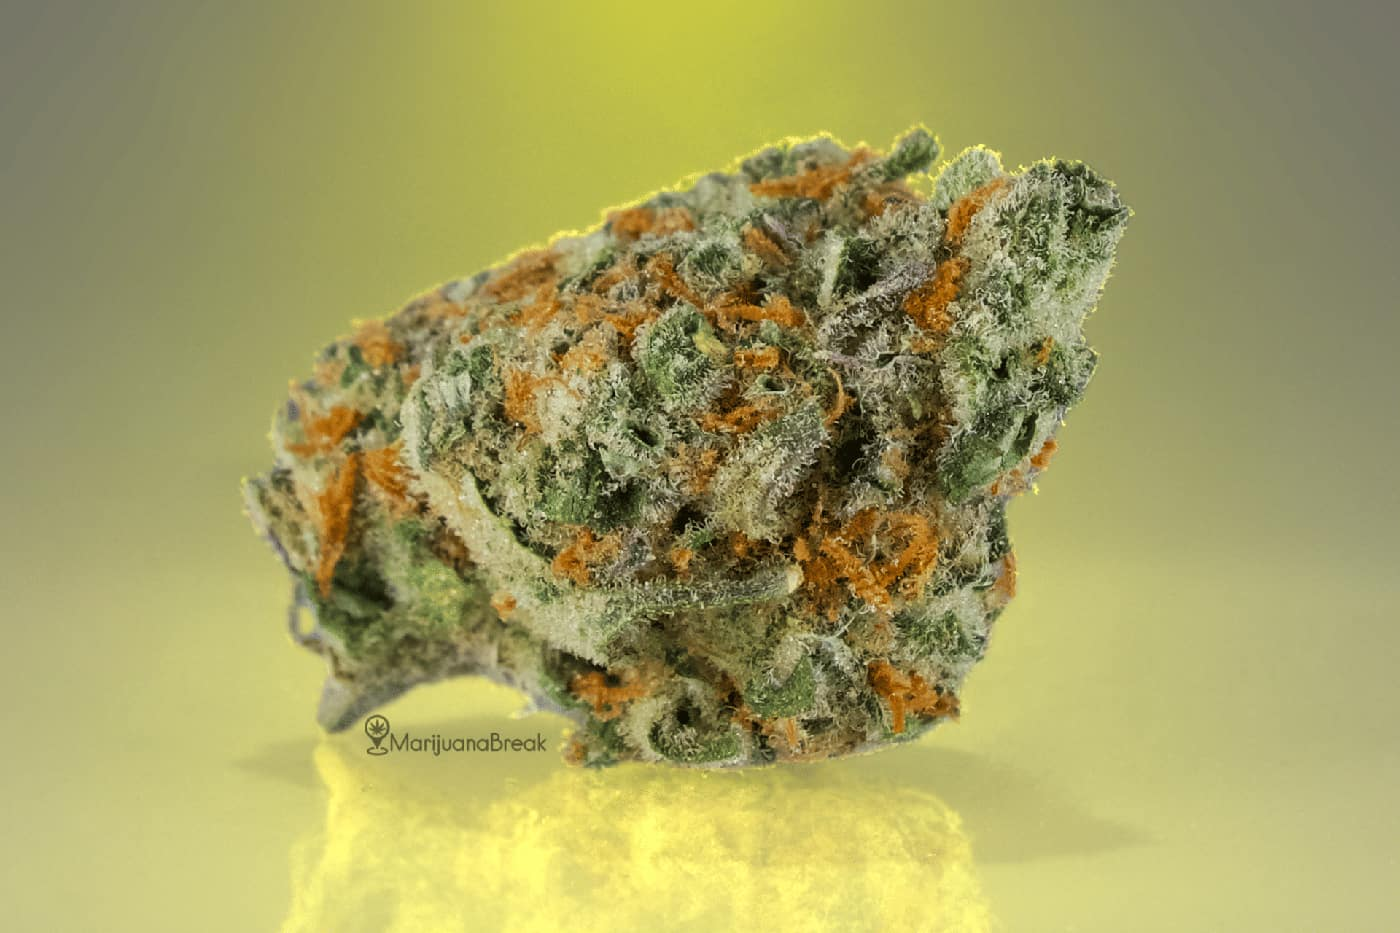 super lemon haze cannabis strain